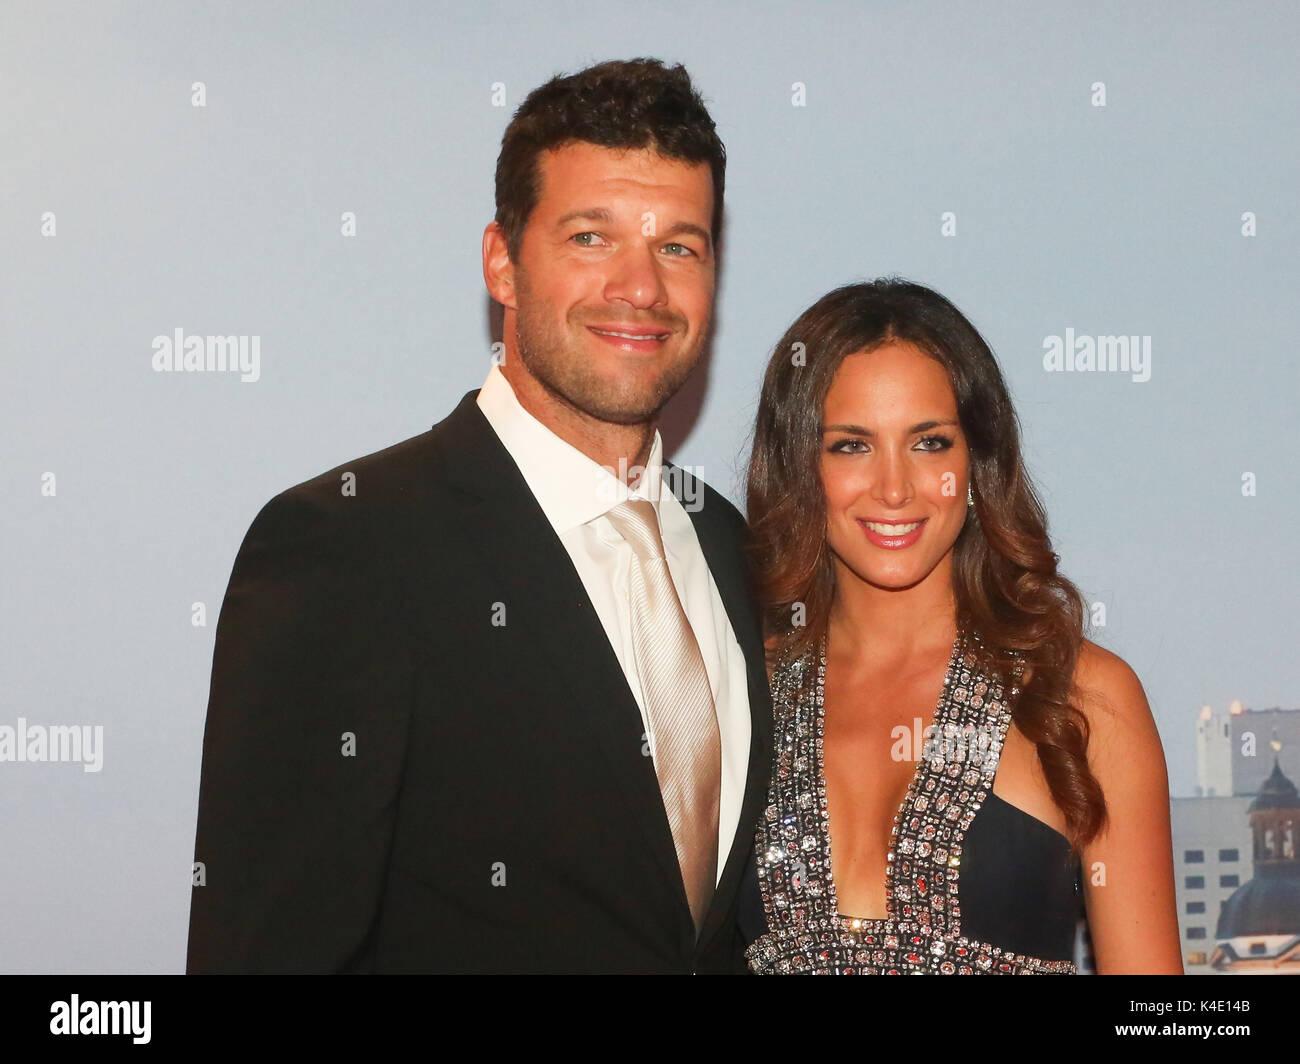 Michael Ballack With Girlfriend Natacha Tannous - Stock Image